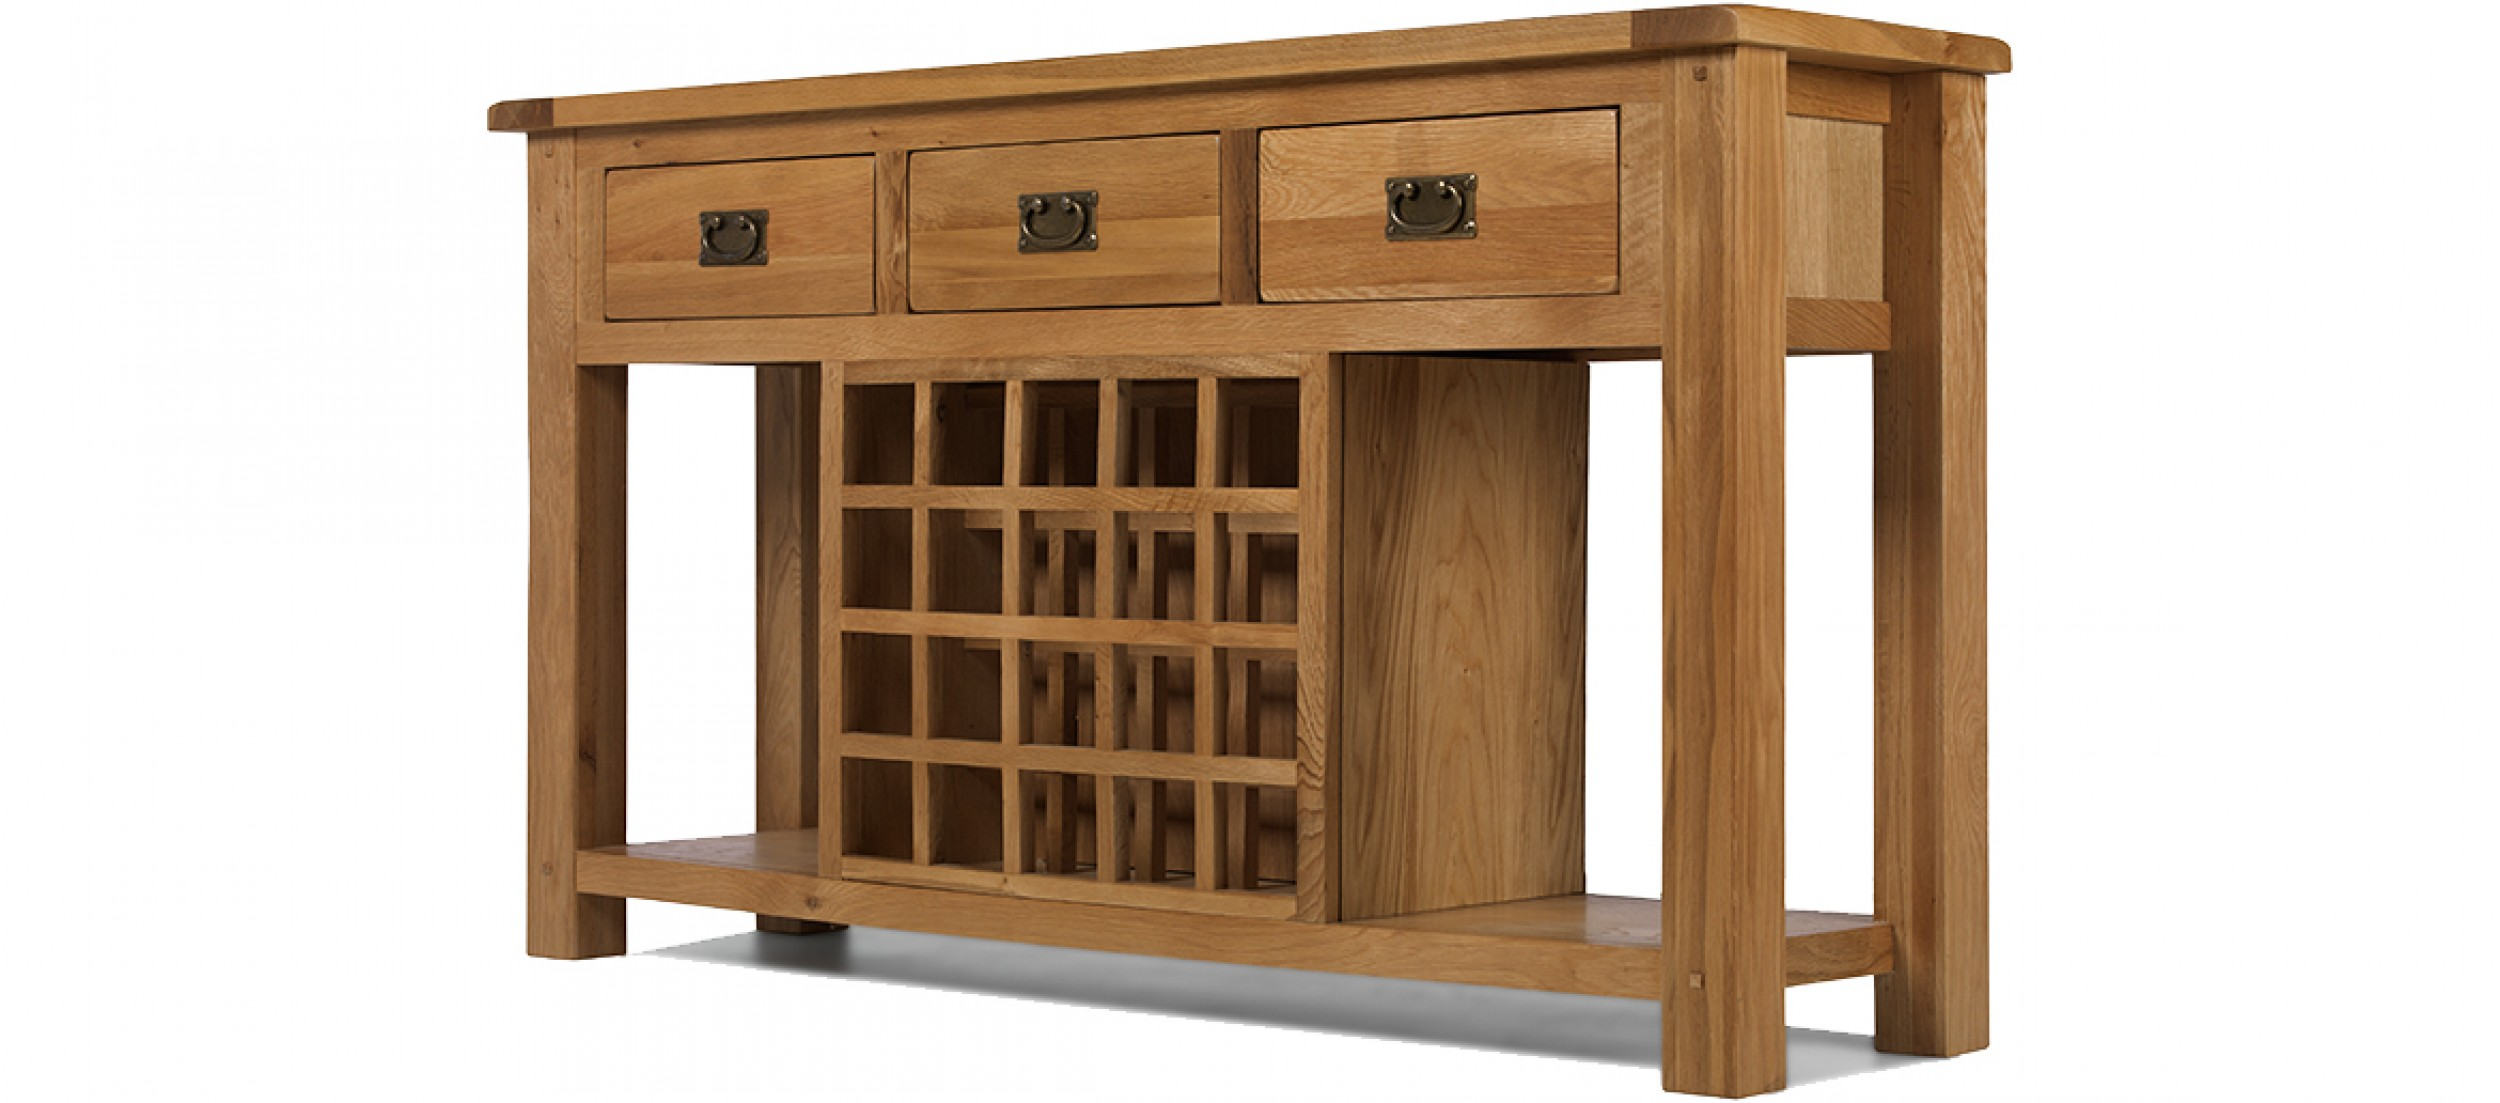 Rustic oak wine rack console table quercus living - Wine bottle storage angle ...